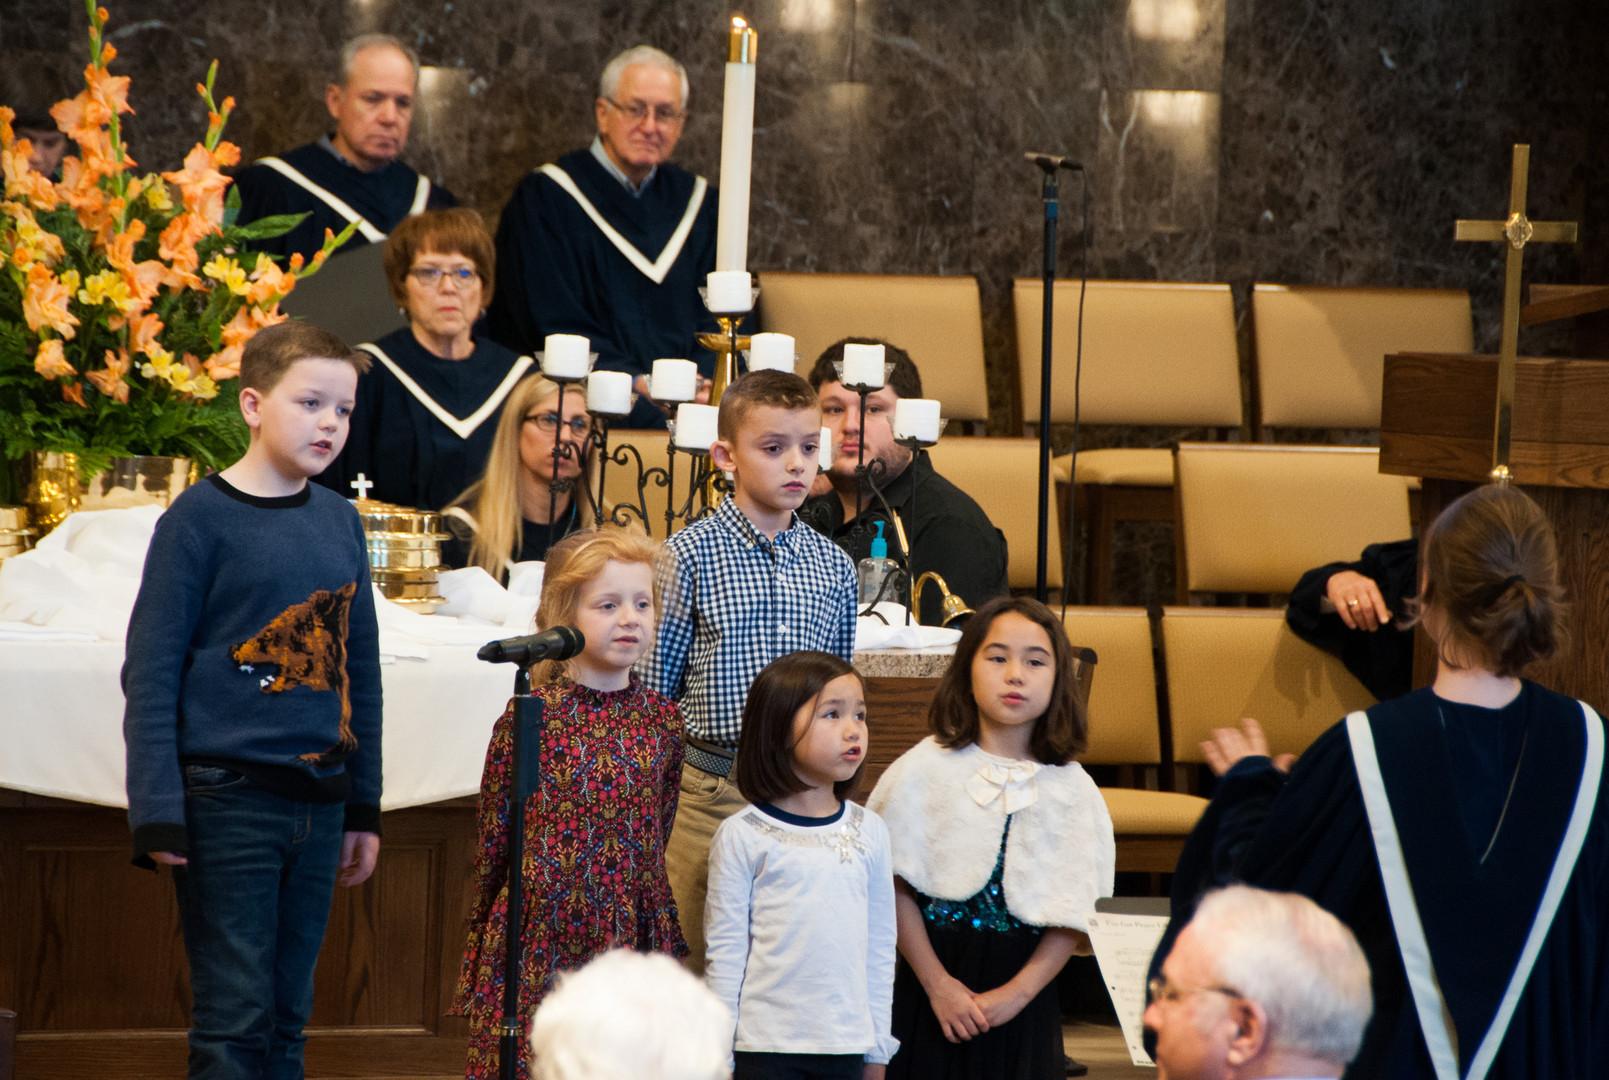 The Rejoice Choir sang beautifully.